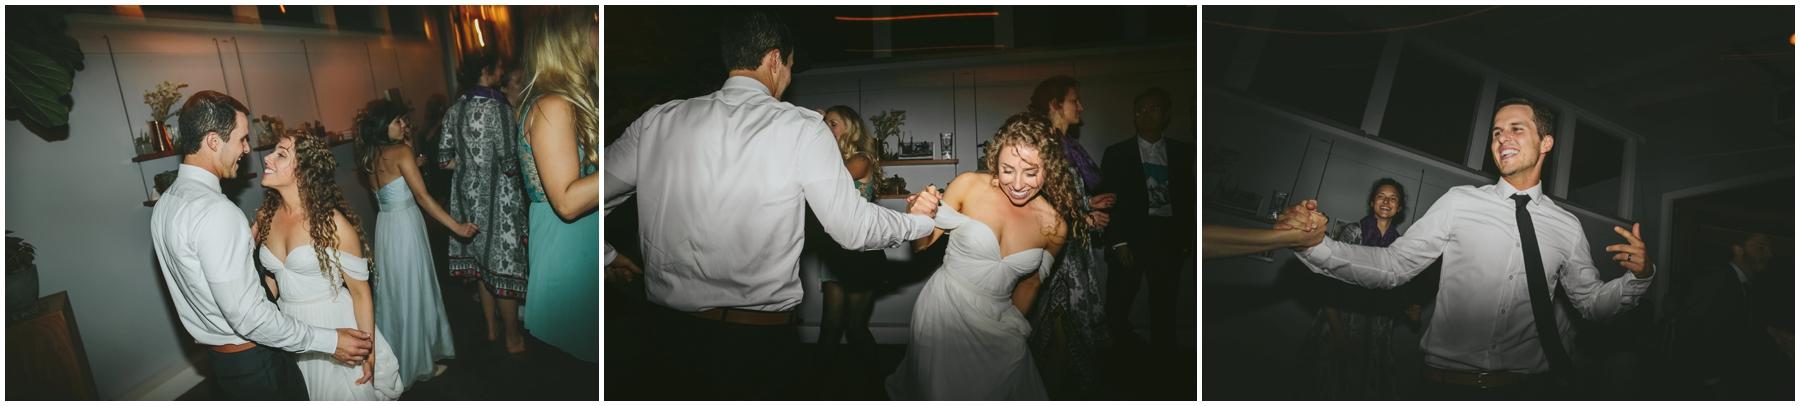 Emily+Paul-WEDDING_KellyBoitanoPhotography_0176